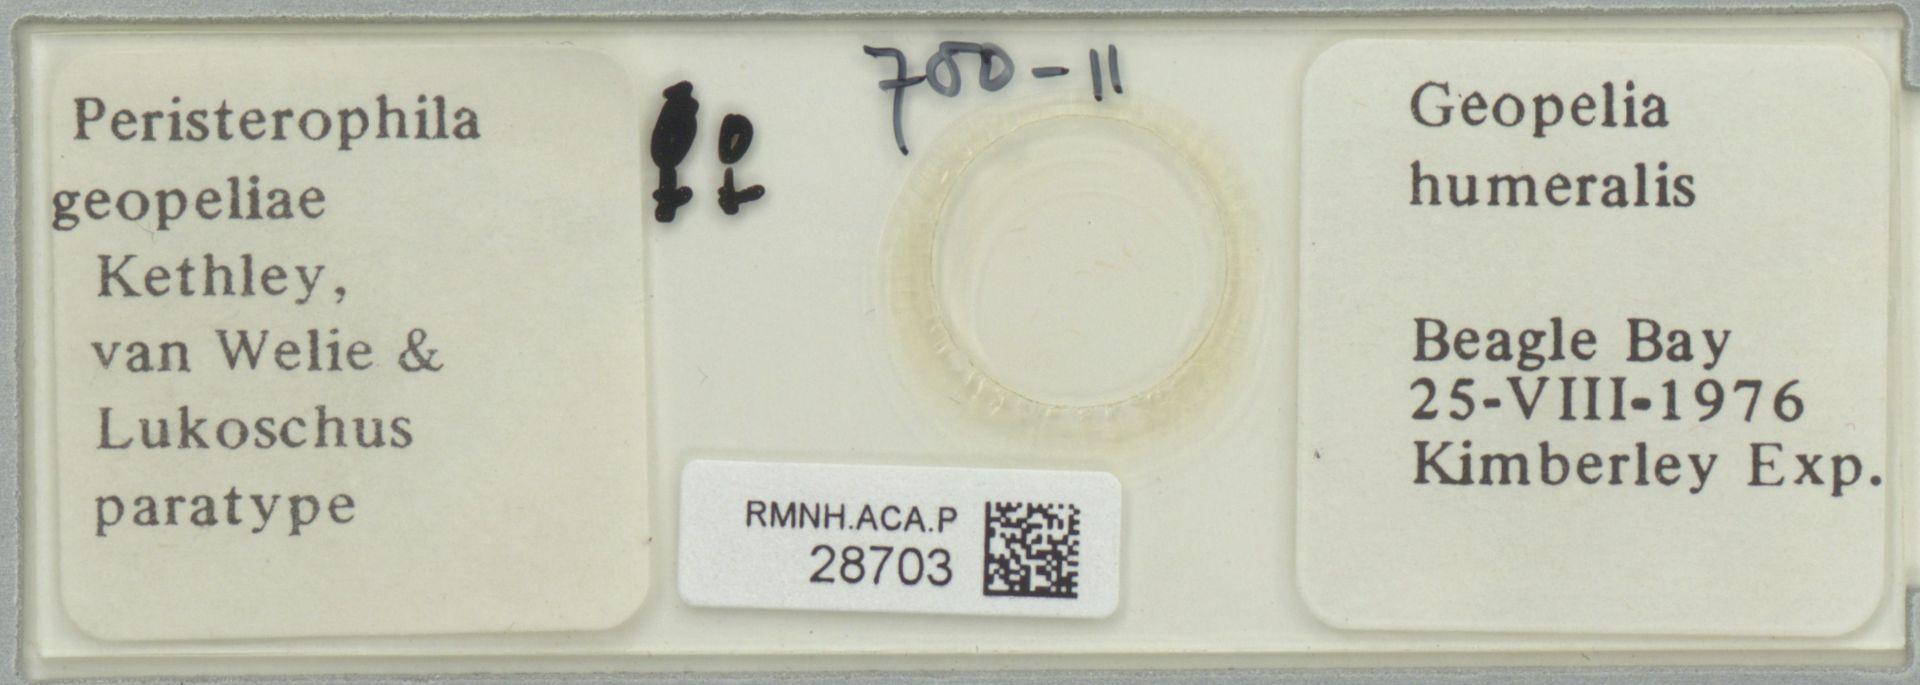 RMNH.ACA.P.28703 | Peristerophila geopeliae Kethley, v. Welie, Lukoschus